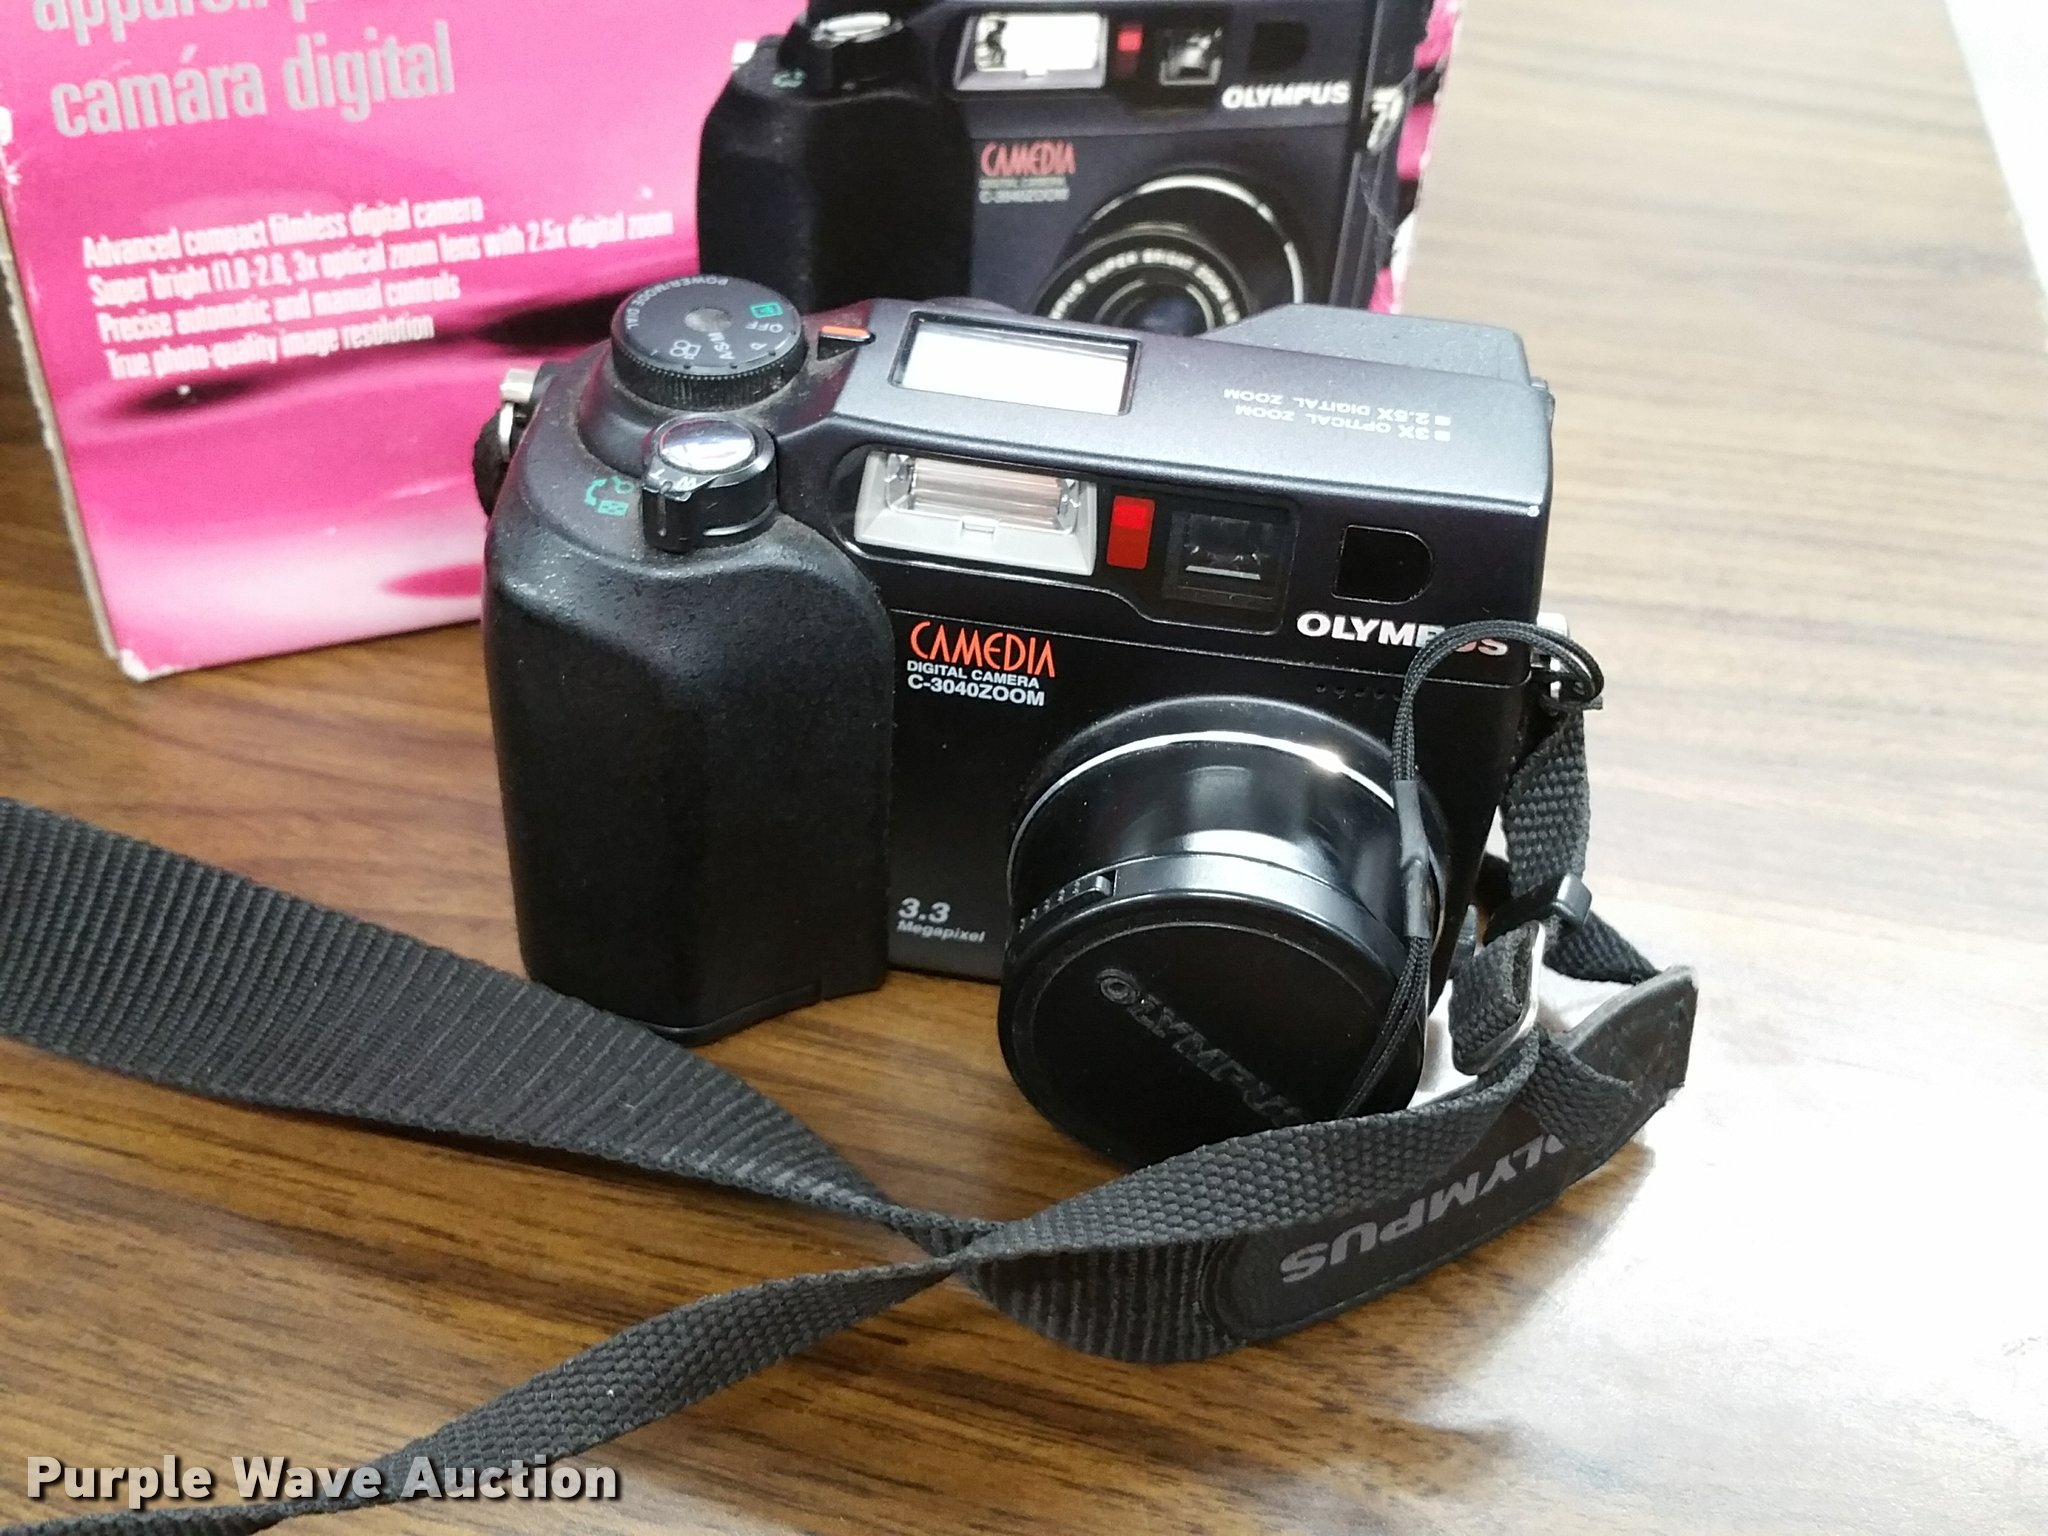 3) Olympus cameras | Item BV9125 | SOLD! August 16 Vehicles